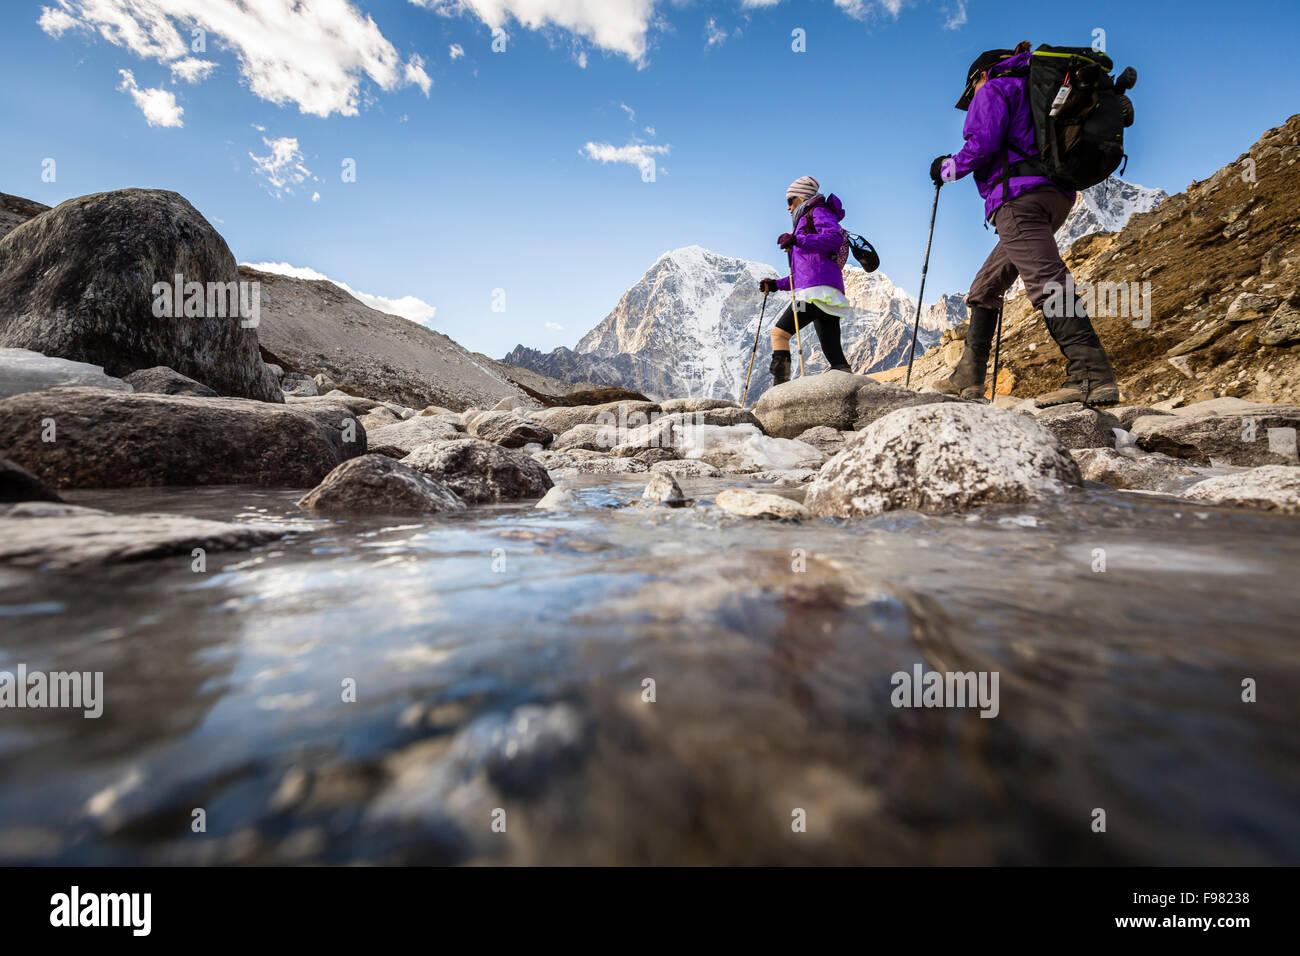 Two women are hiking a trail, Sagarmatha National Park, Khumbu region, Nepal. - Stock Image